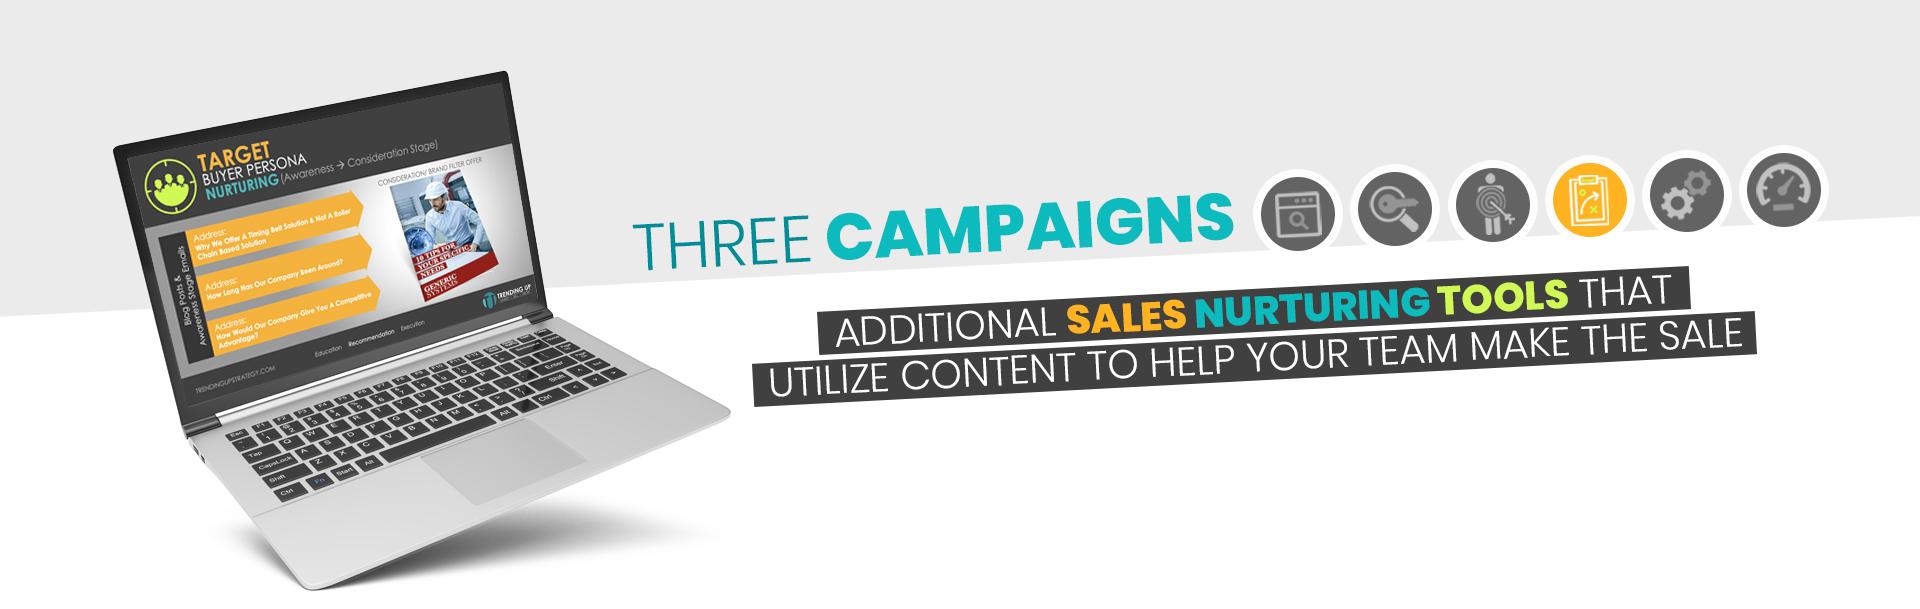 Campaign - Sales Nurturing